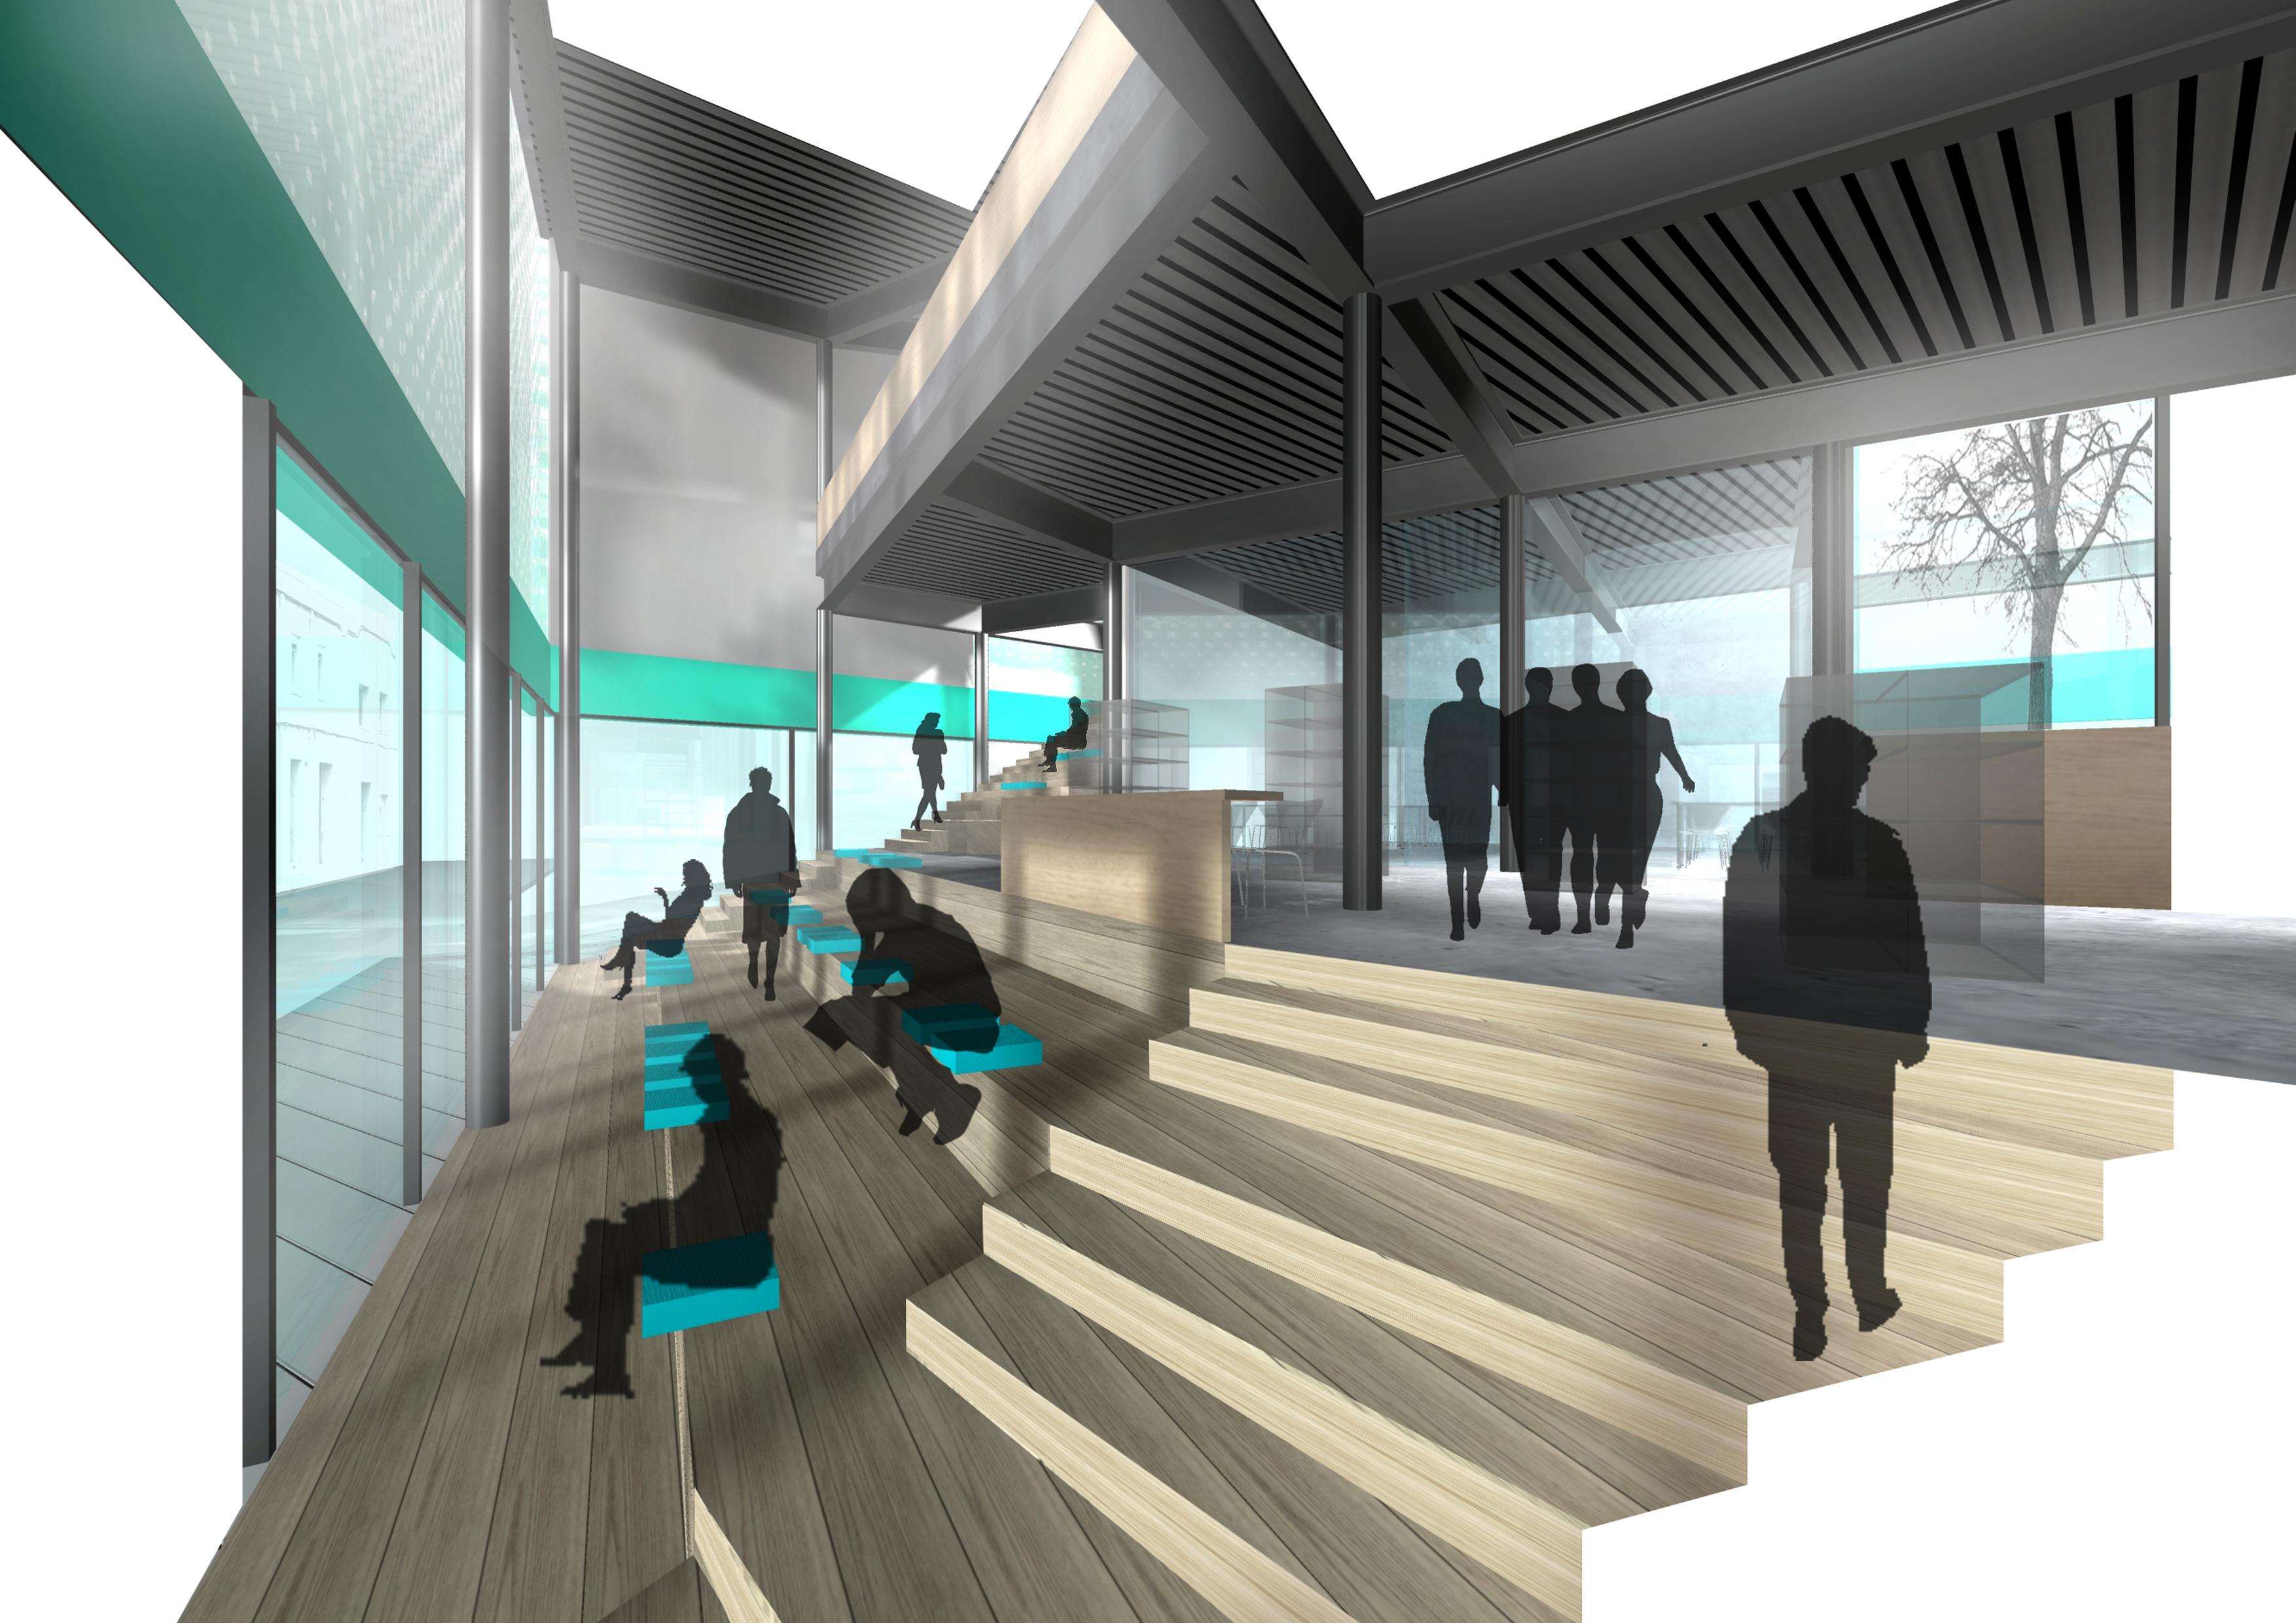 Sala Ferusic Architects 8uit Carles Sala Relja Ferusic